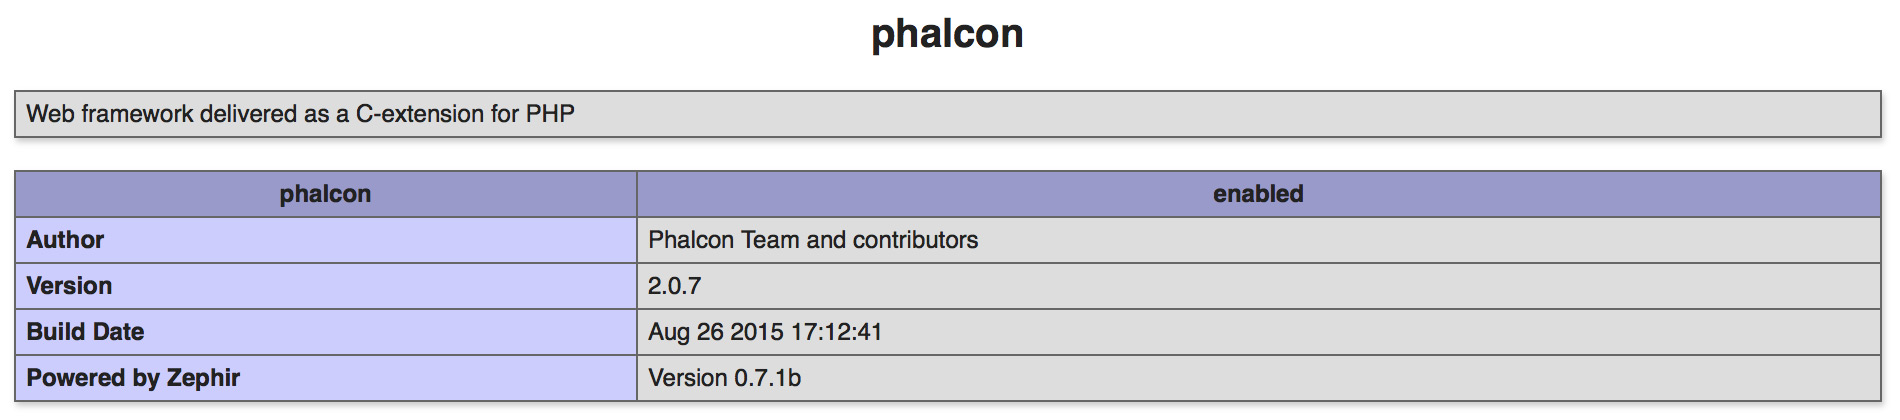 GitHub - majksner/php-phalcon-mamp: Phalcon is a web